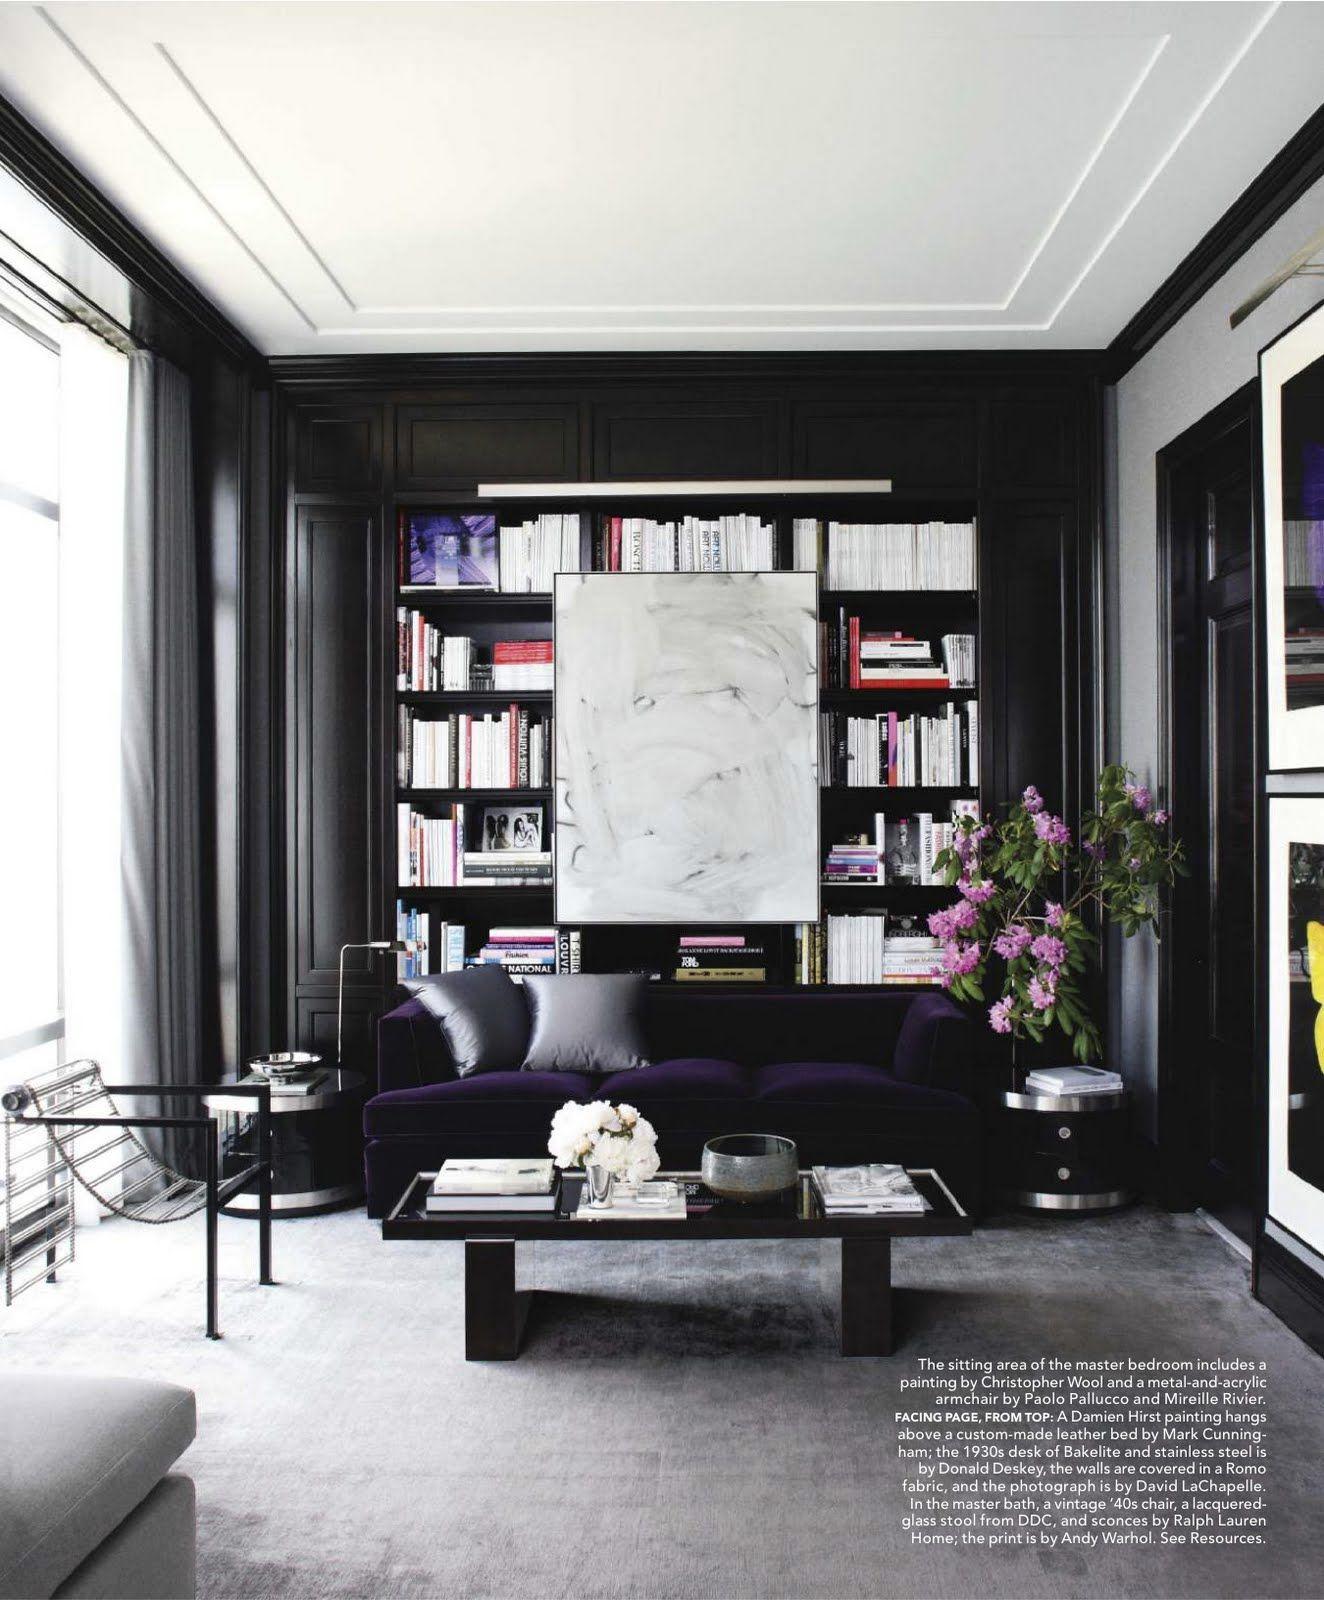 Black Wall Shelves hana soukupová & drew aaron apartment. christopher wool painting